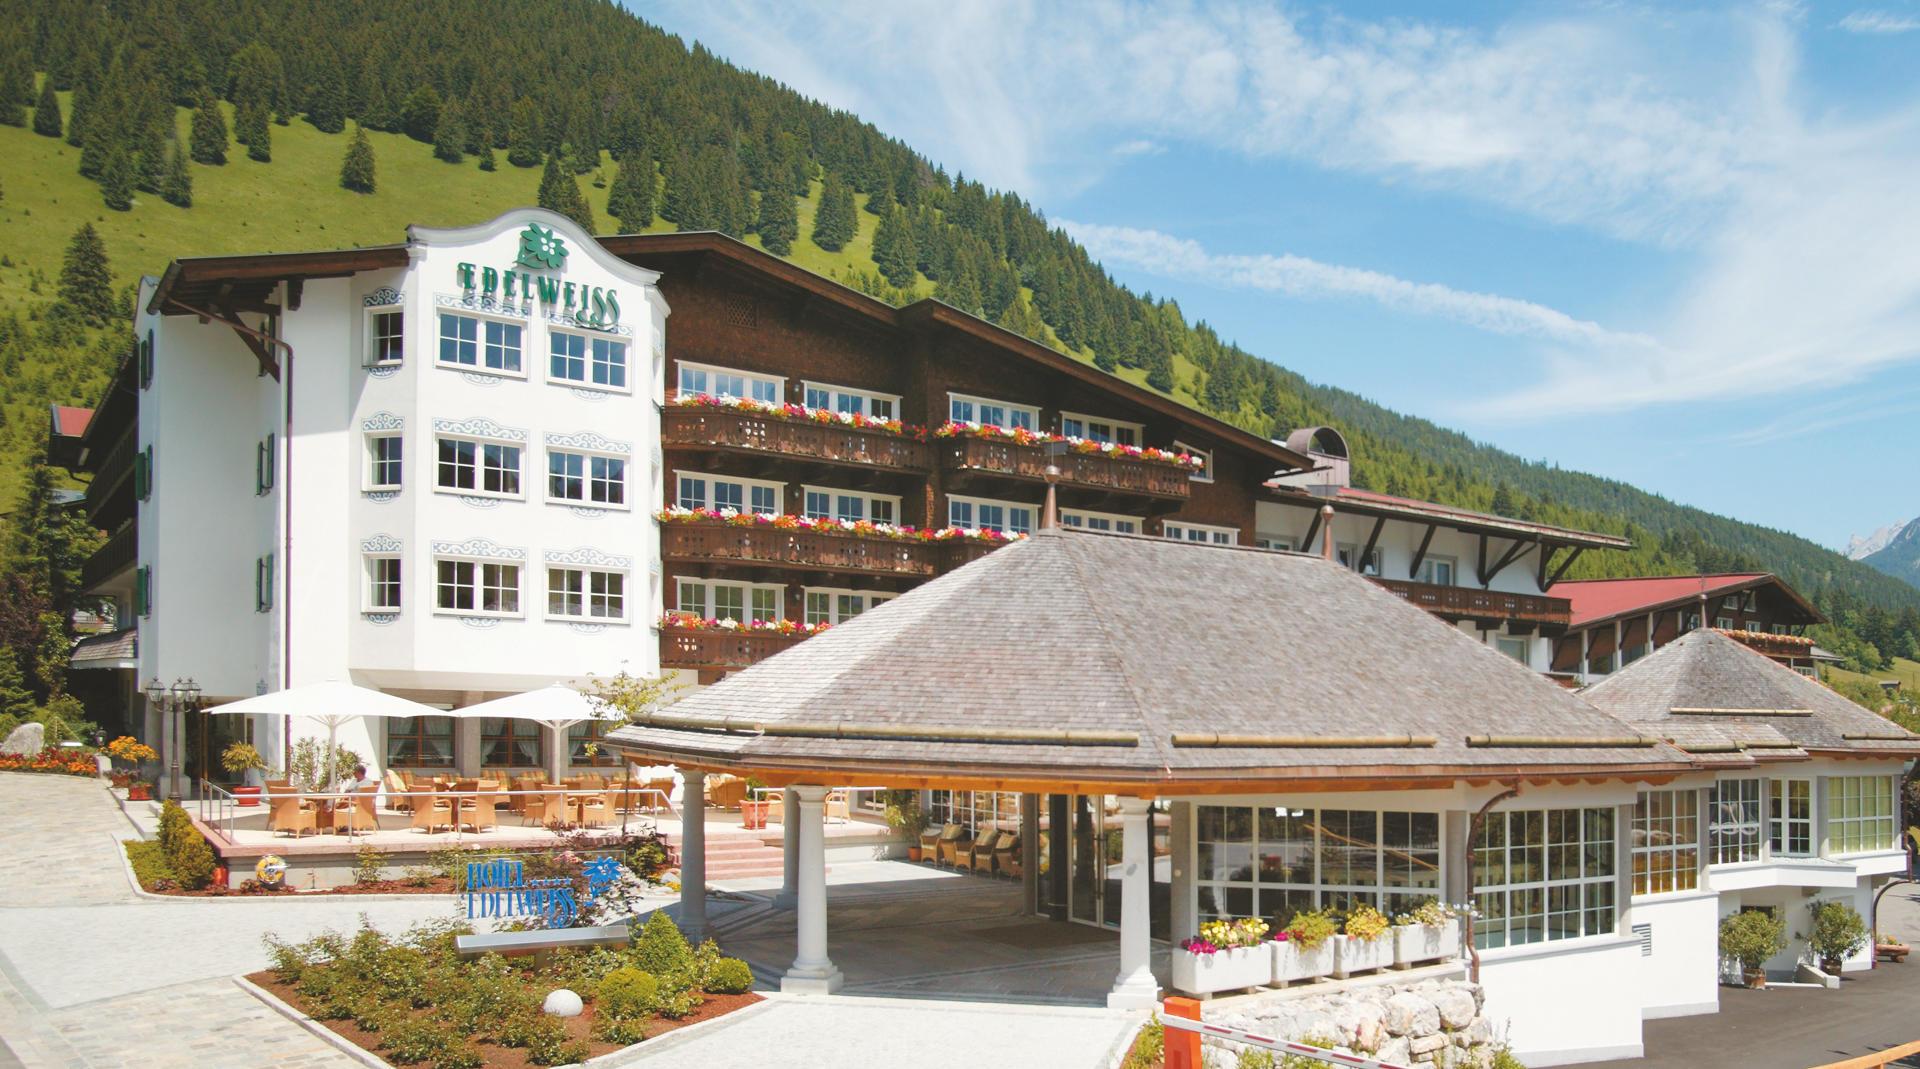 Hotel Edelweiss Obergurgl Booking